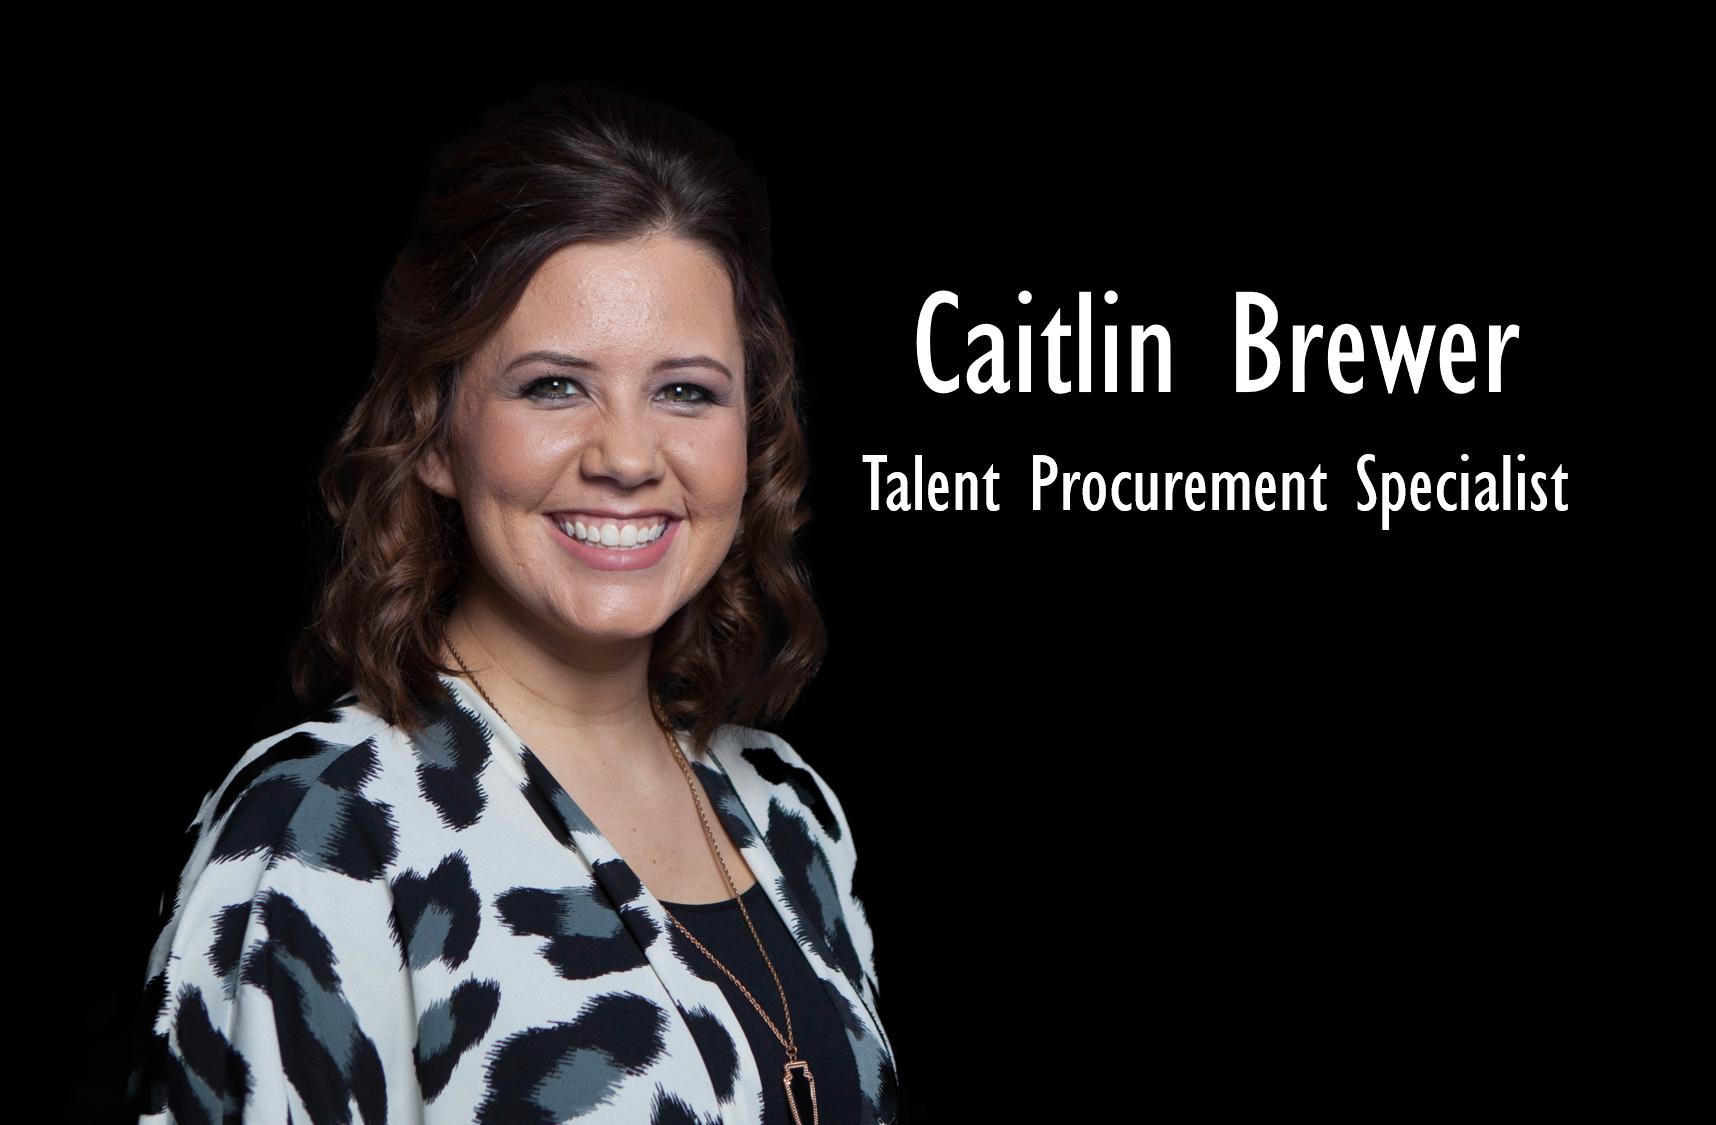 Caitlin Brewer